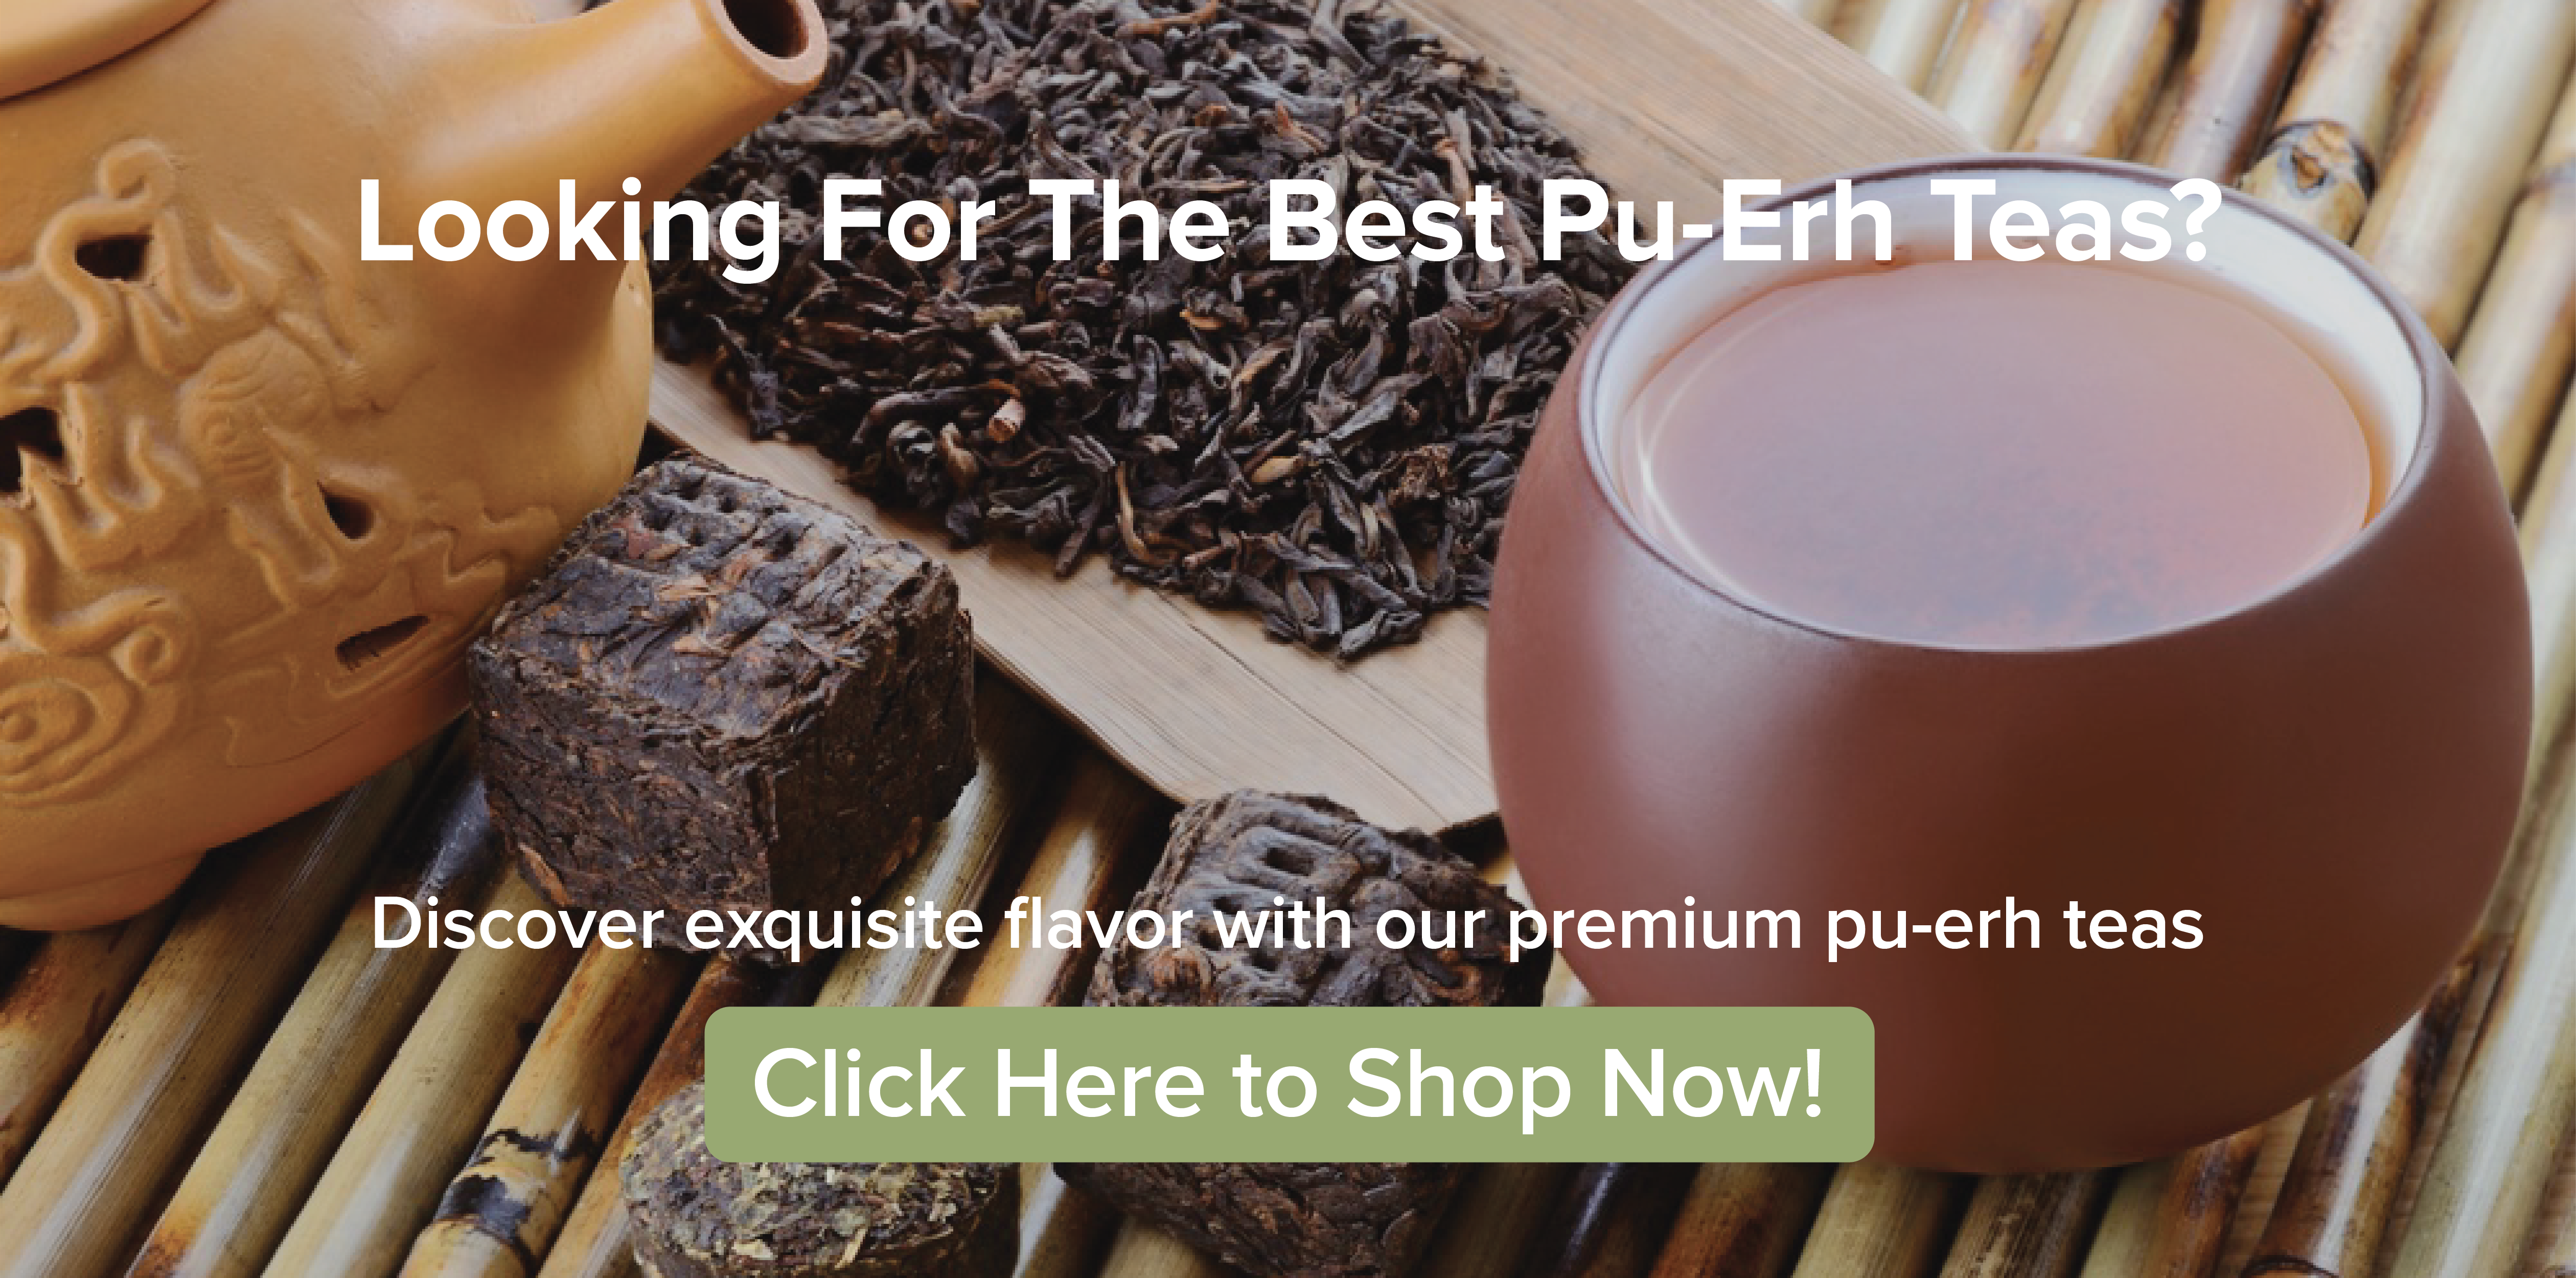 8 Pu-erh Tea Health Benefits You Should Know About - Cup & Leaf